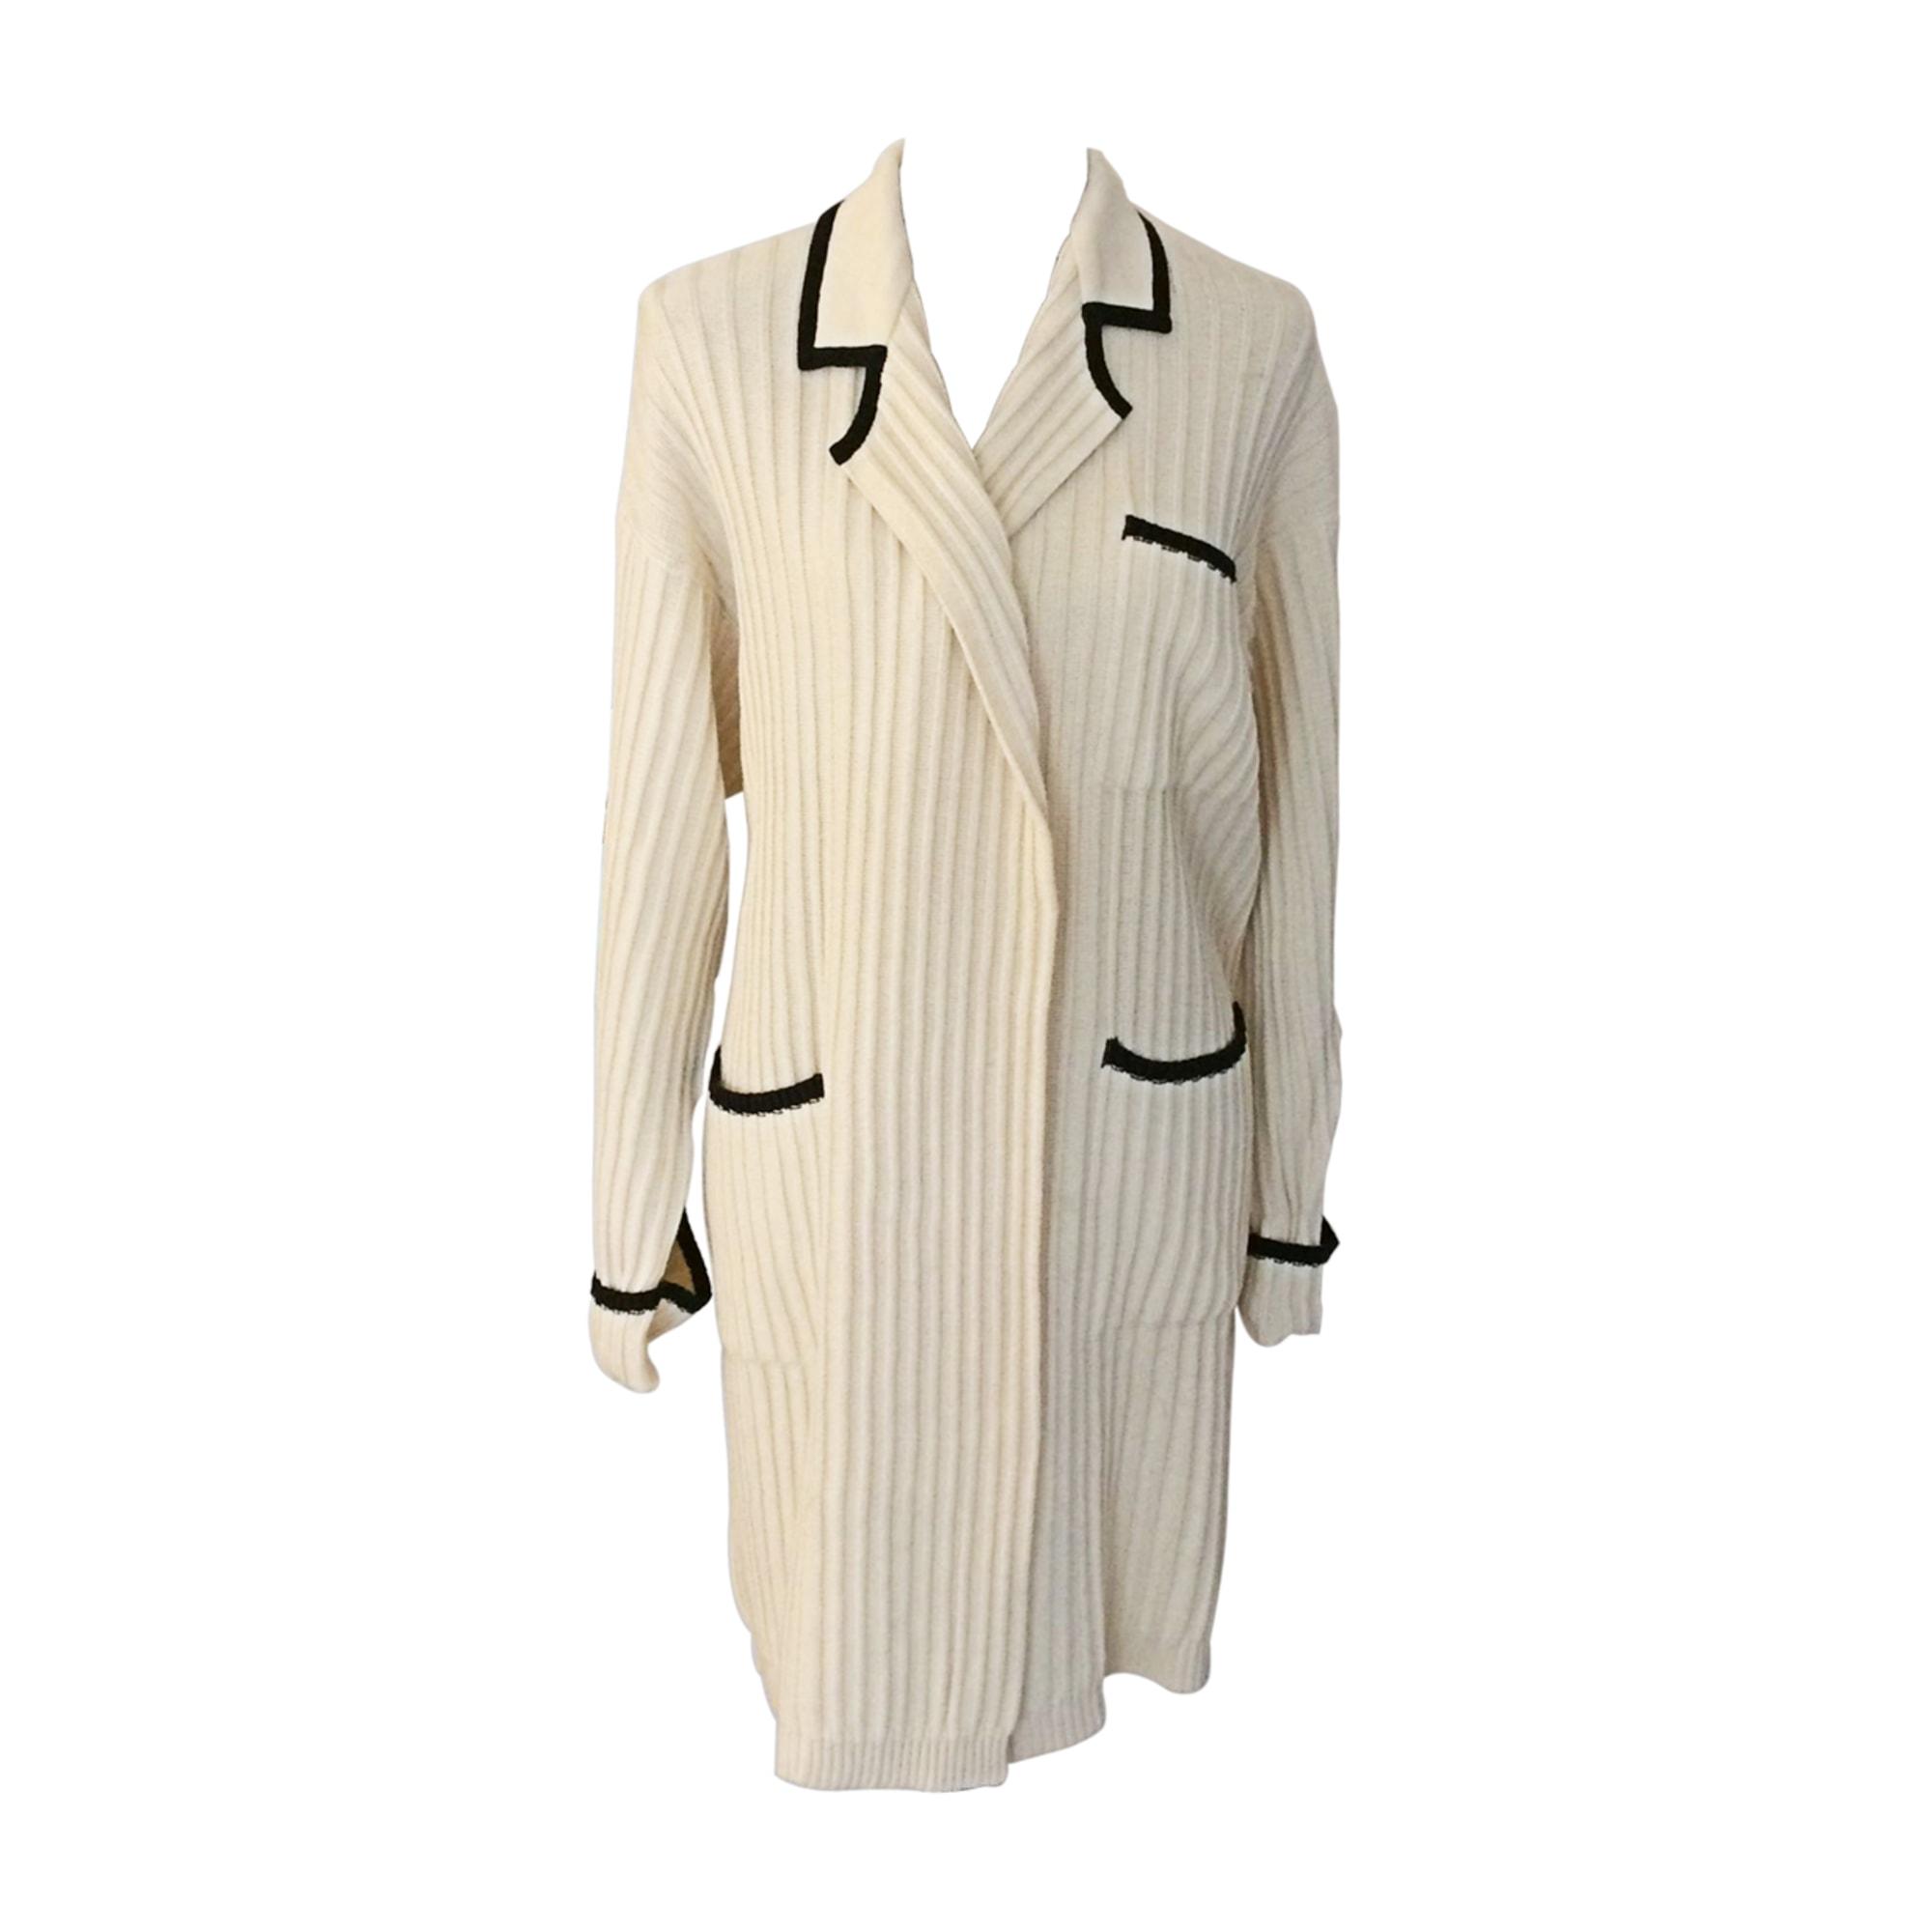 Mantel SONIA RYKIEL Weiß, elfenbeinfarben